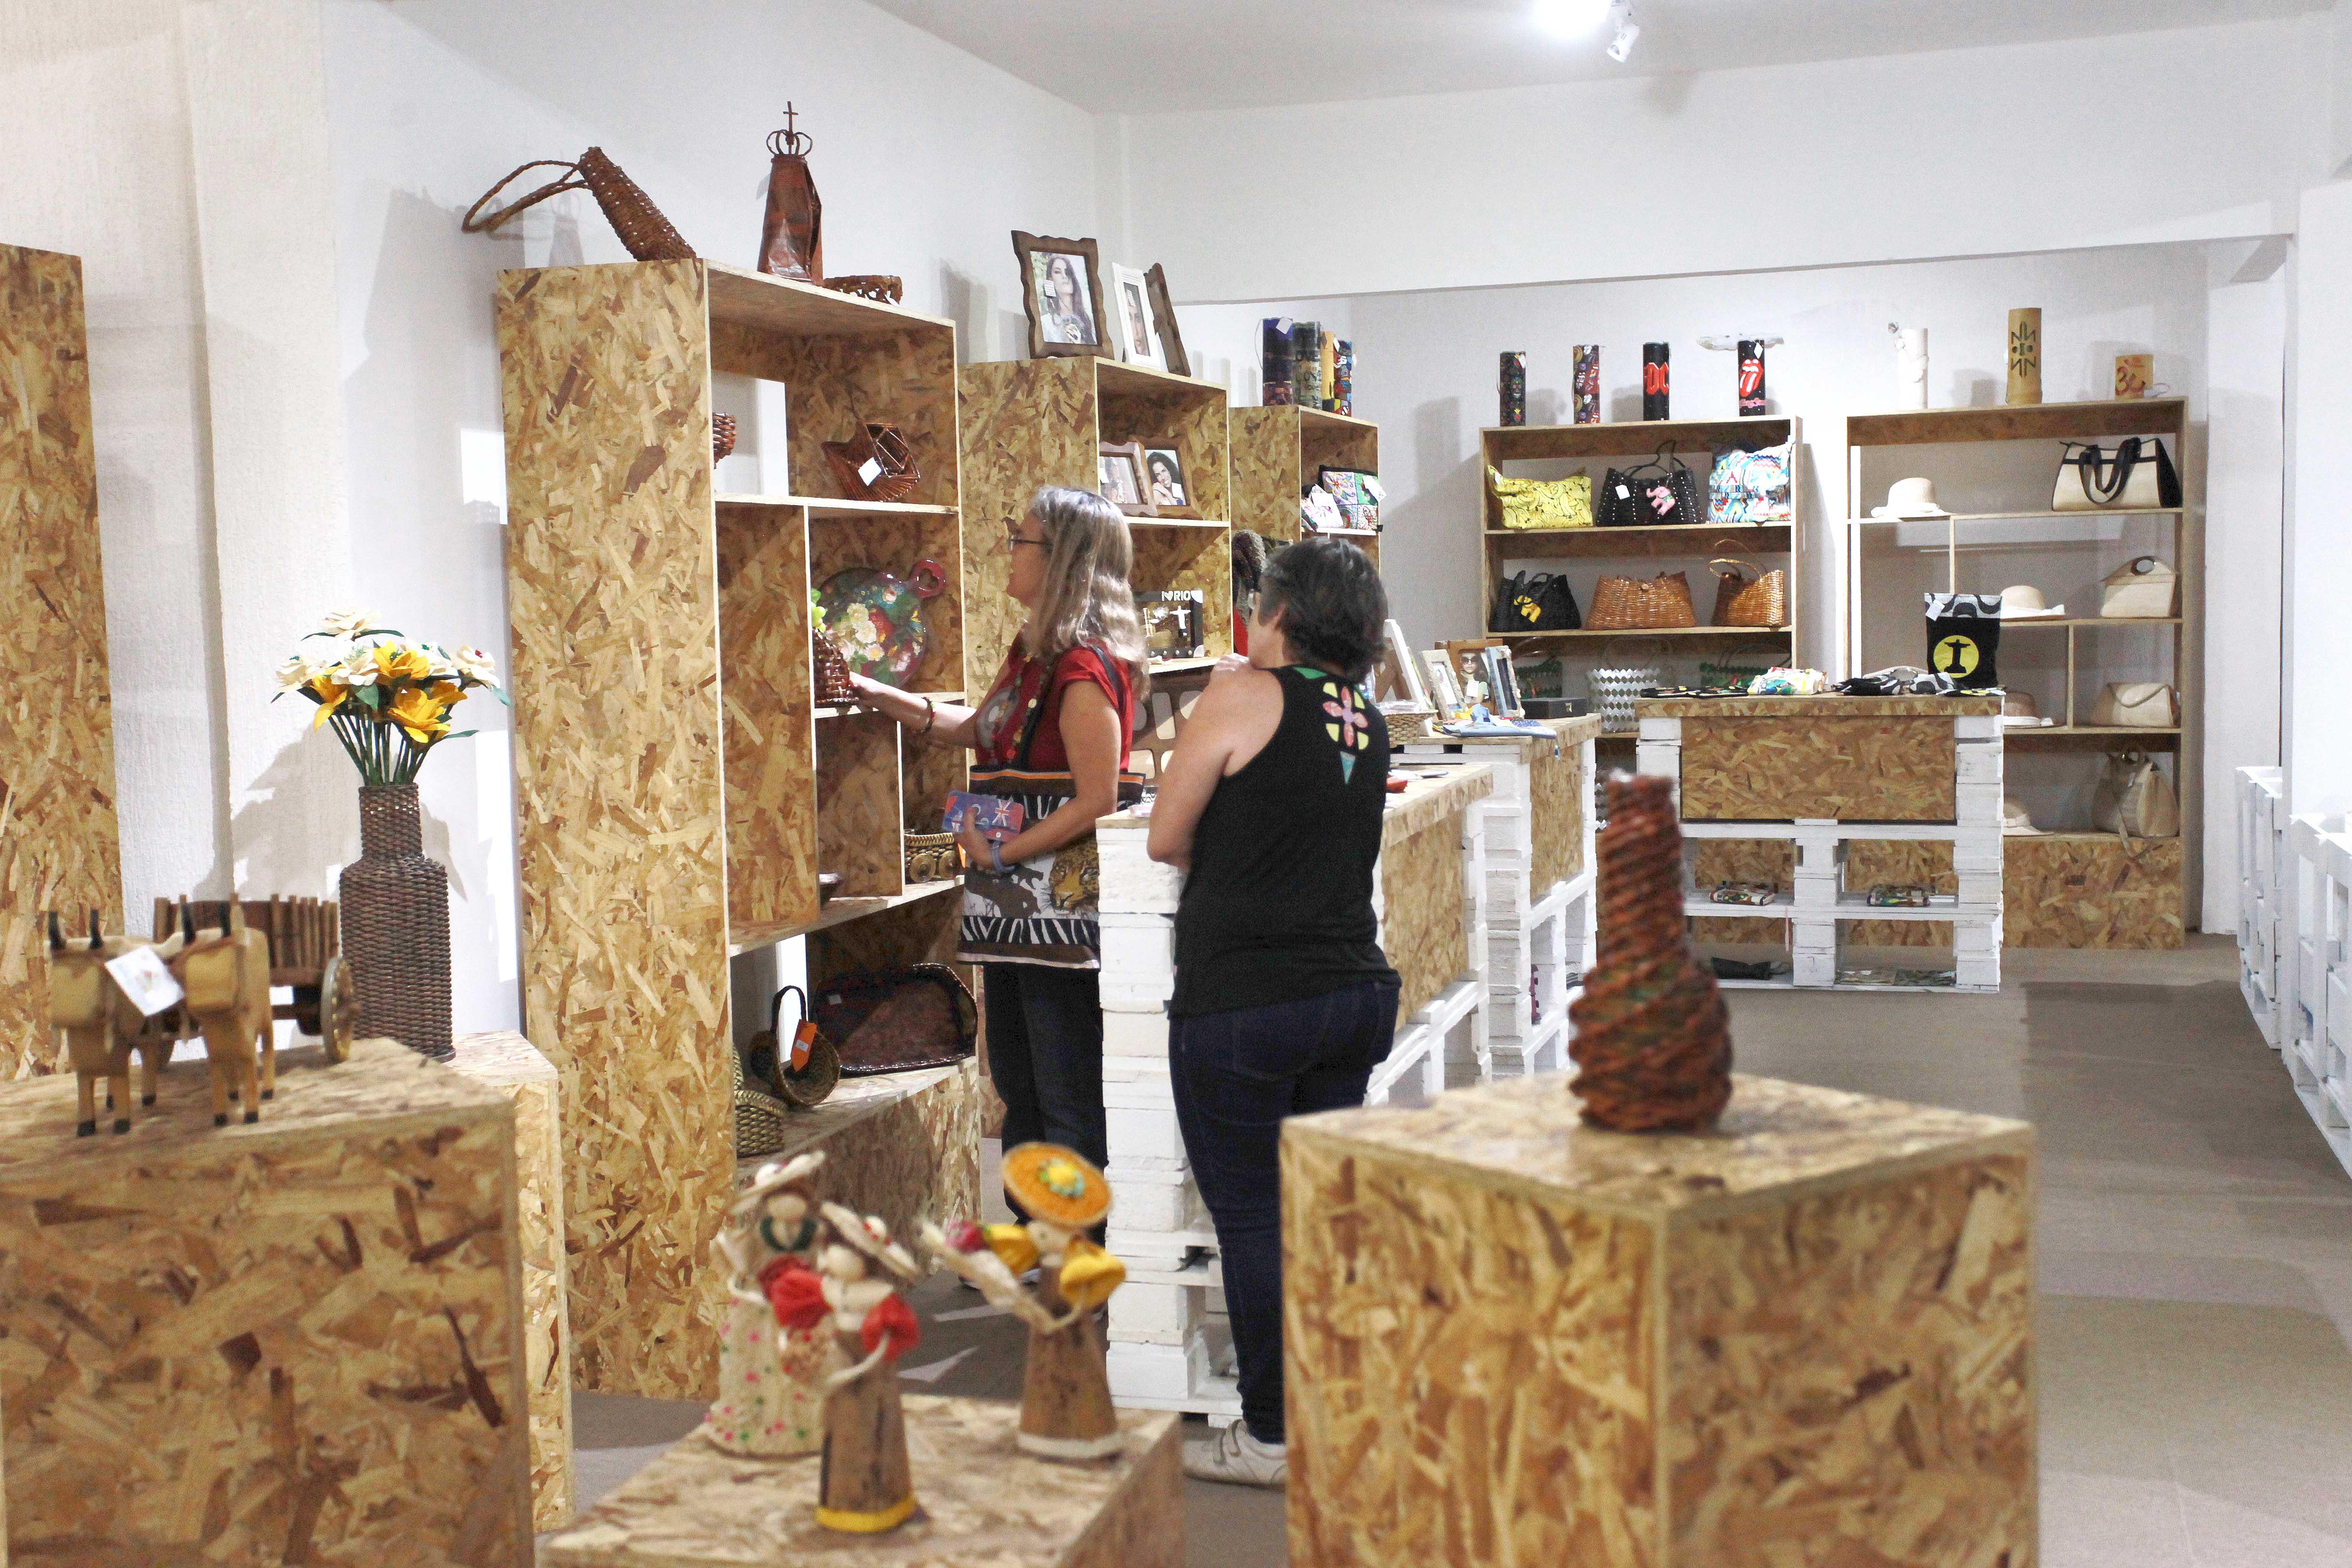 Adesivo Decorativo Para Potes De Vidro ~ Artesanato entra no roteiro turístico do Rio de Janeiro